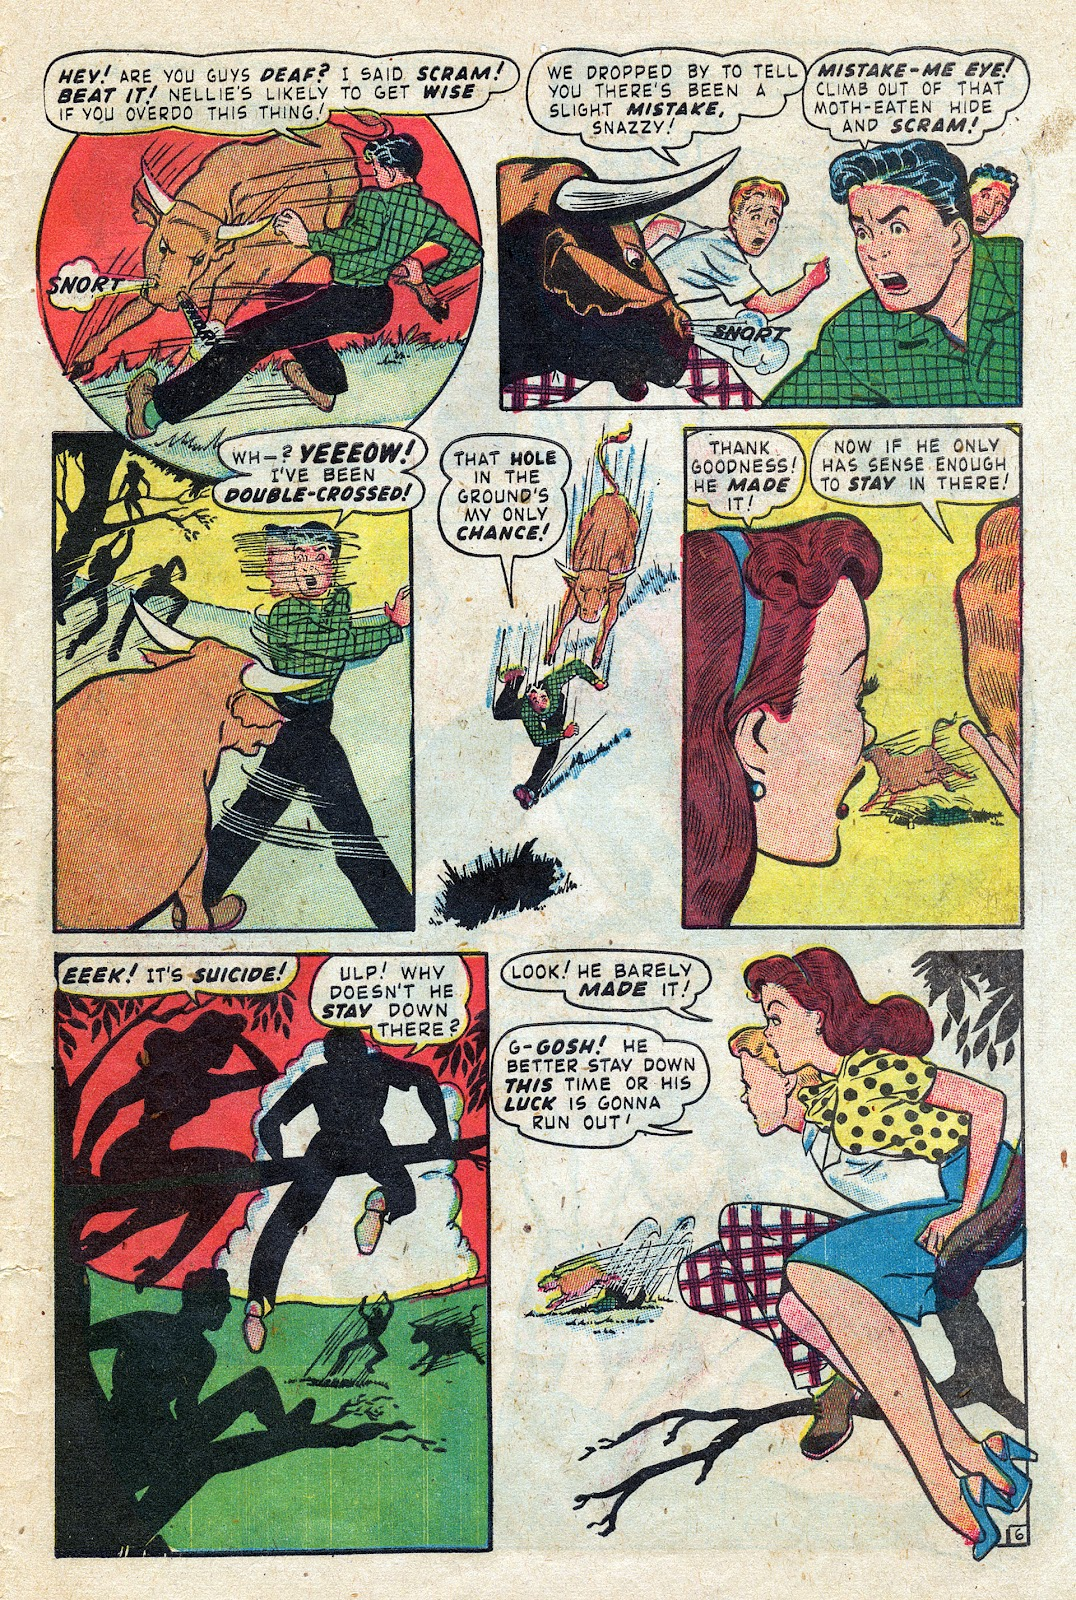 Read online Gay Comics comic -  Issue #30 - 31